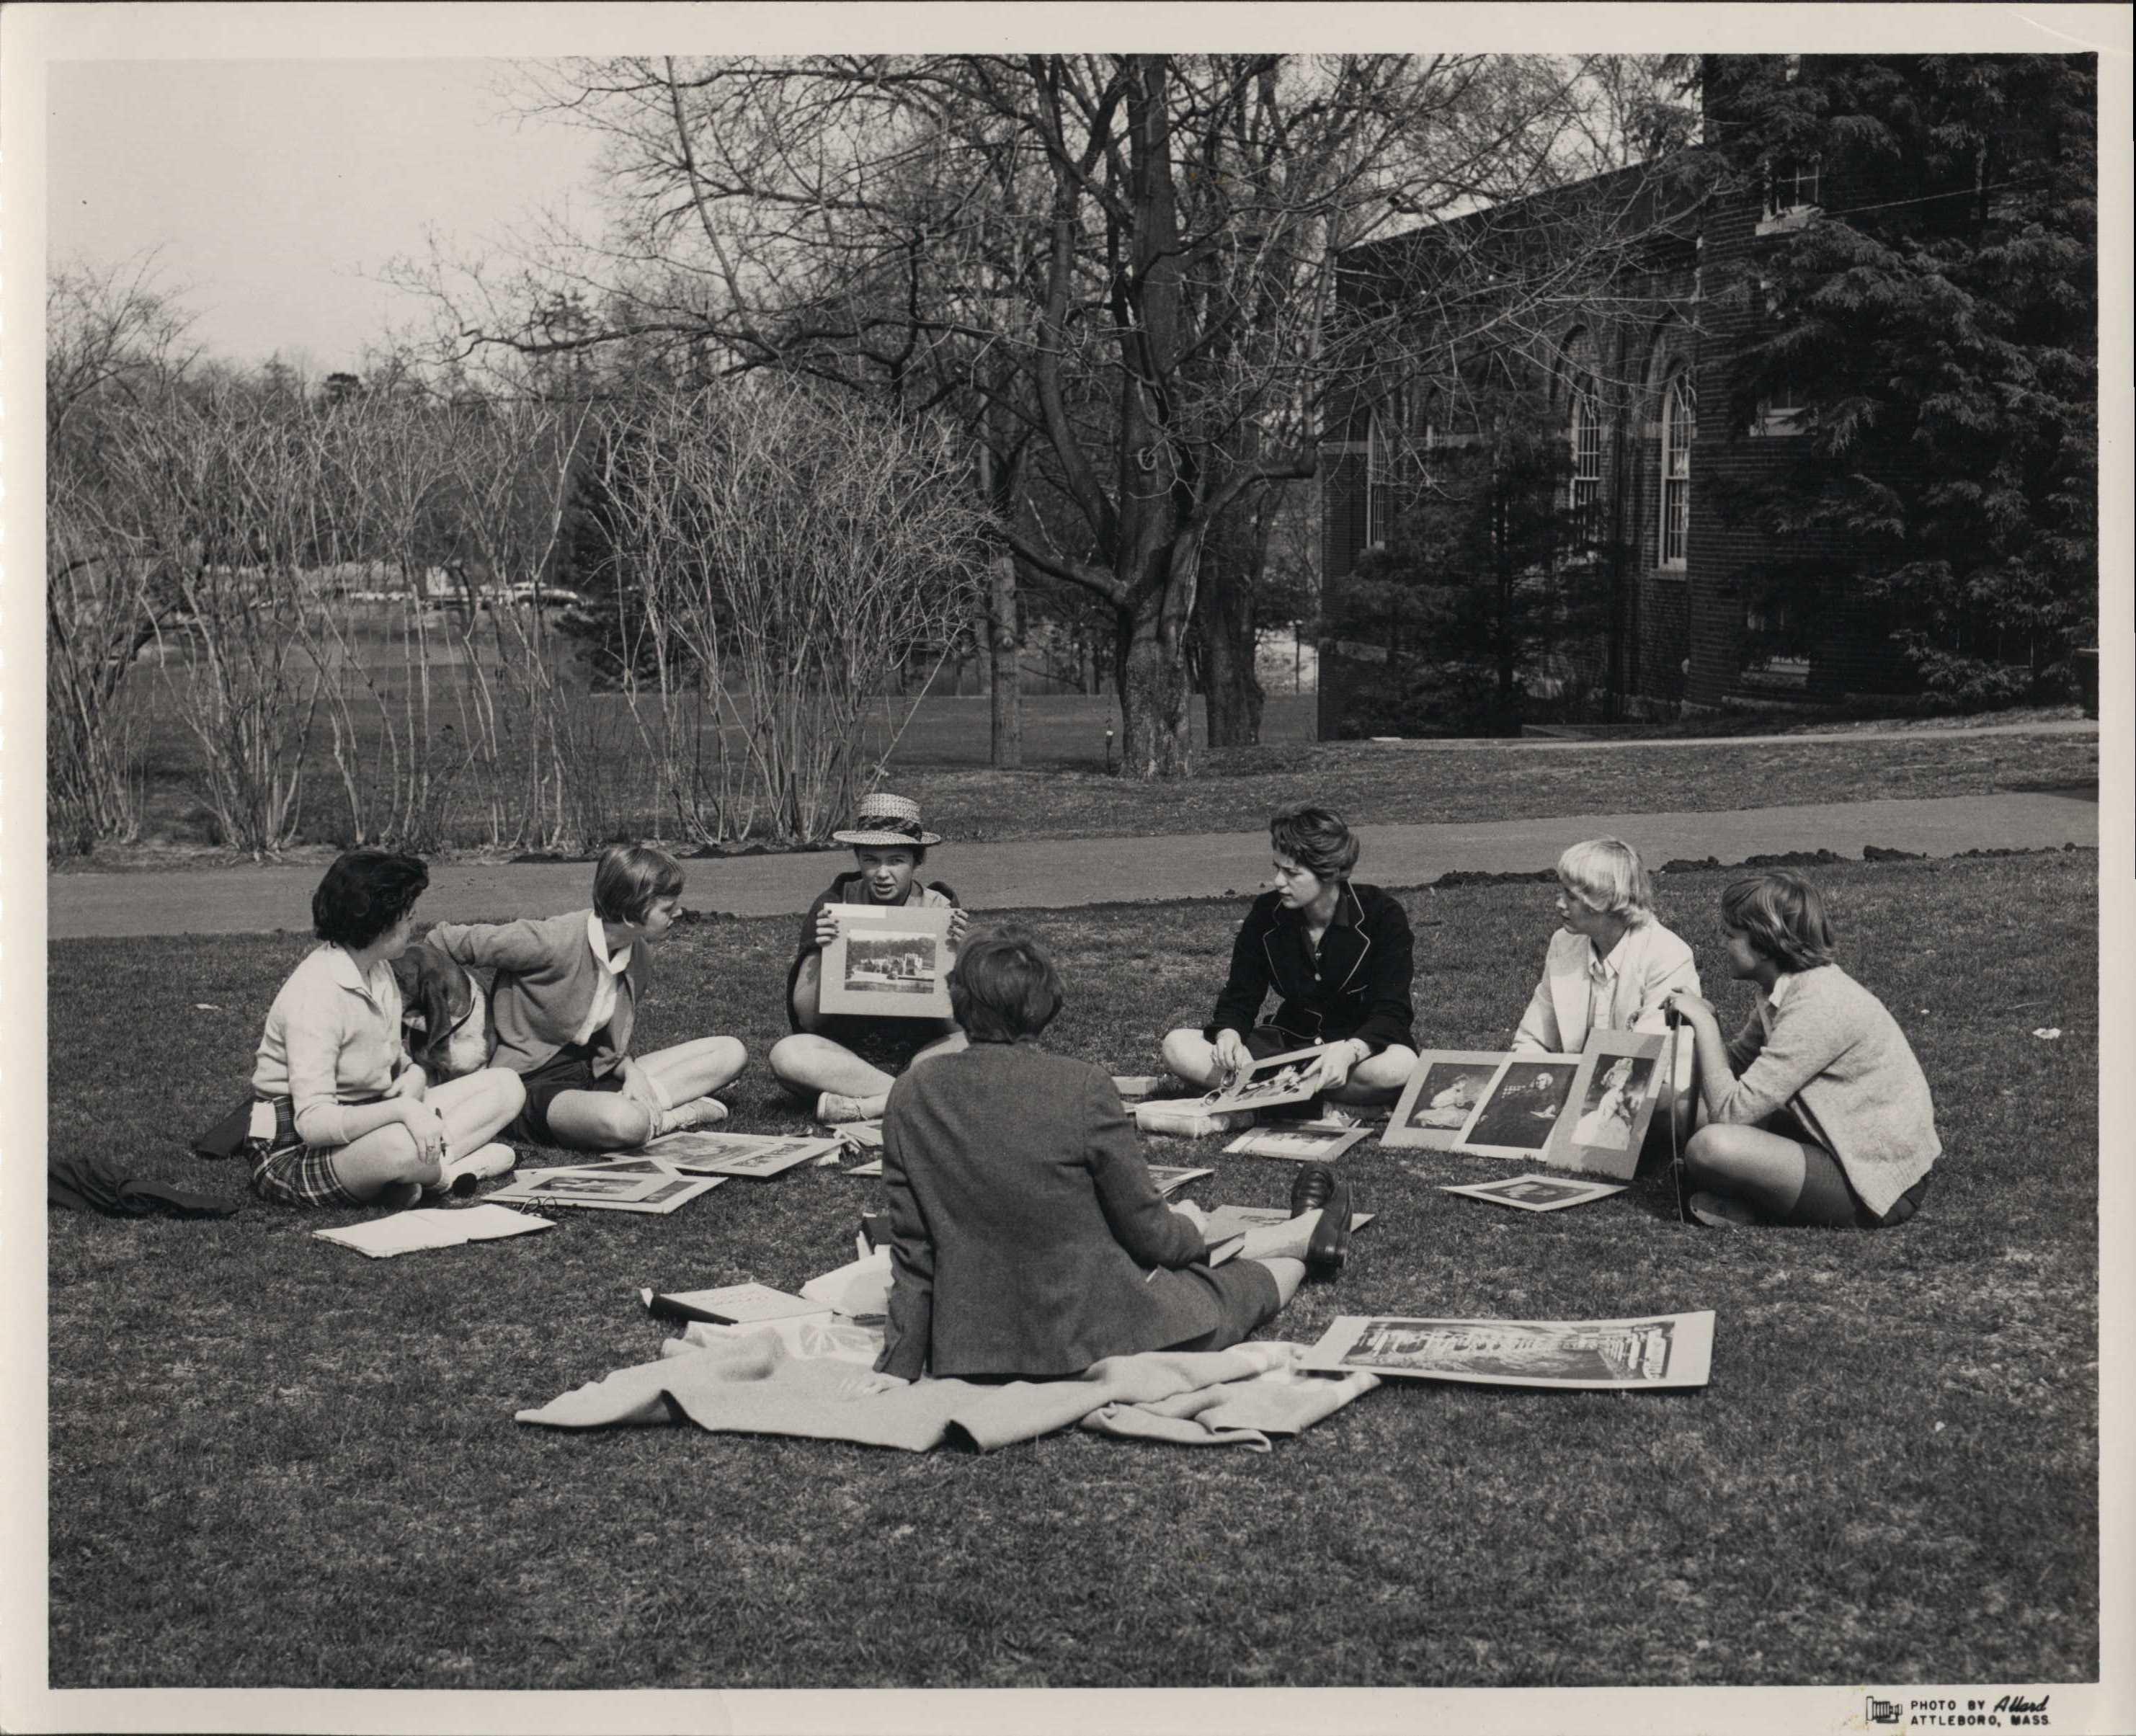 Class of 1961, 1958